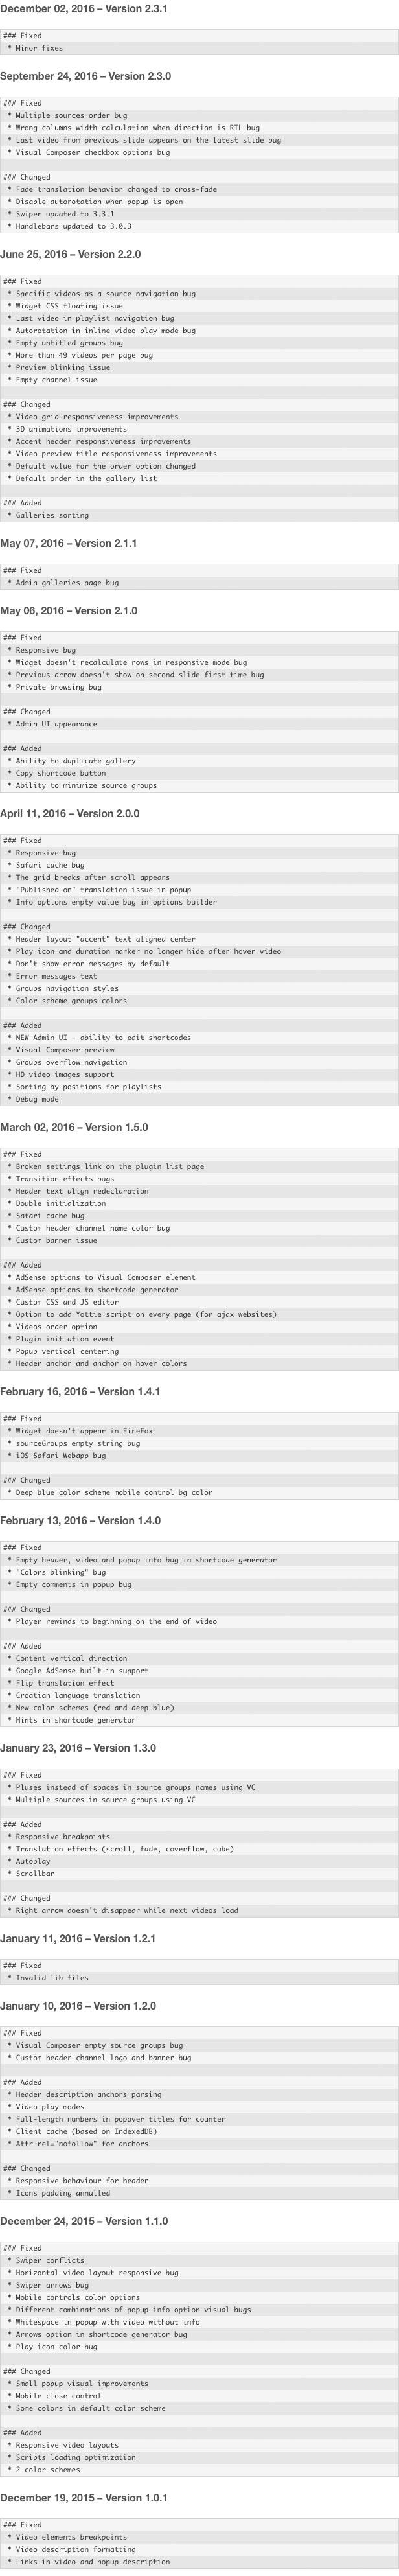 YouTube Plugin - WordPress Gallery for YouTube 22